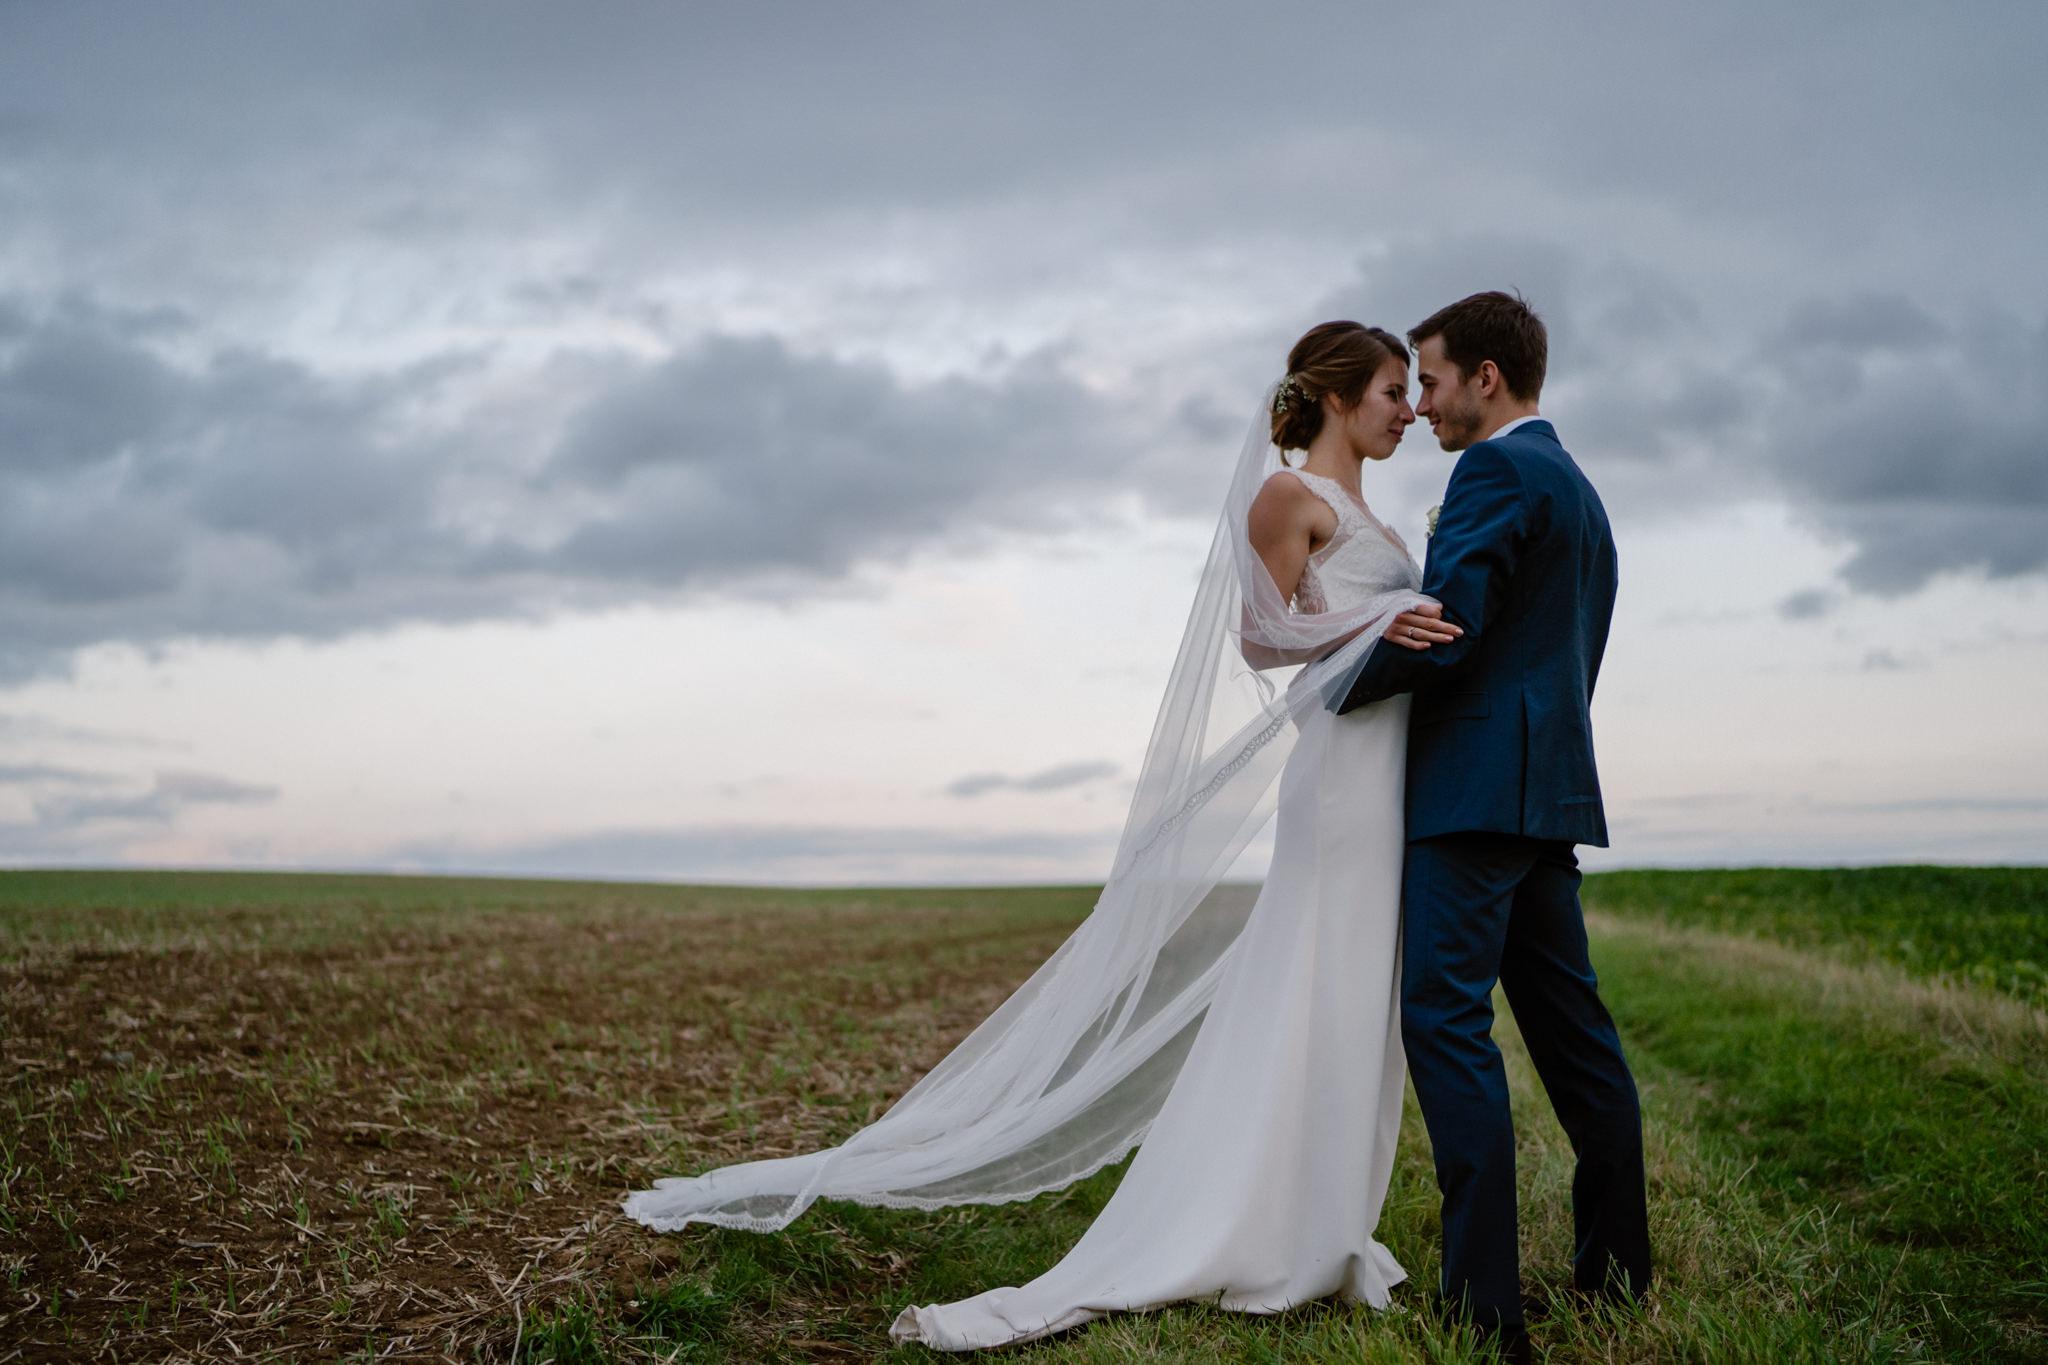 photographe de mariage Nicolas Michiels